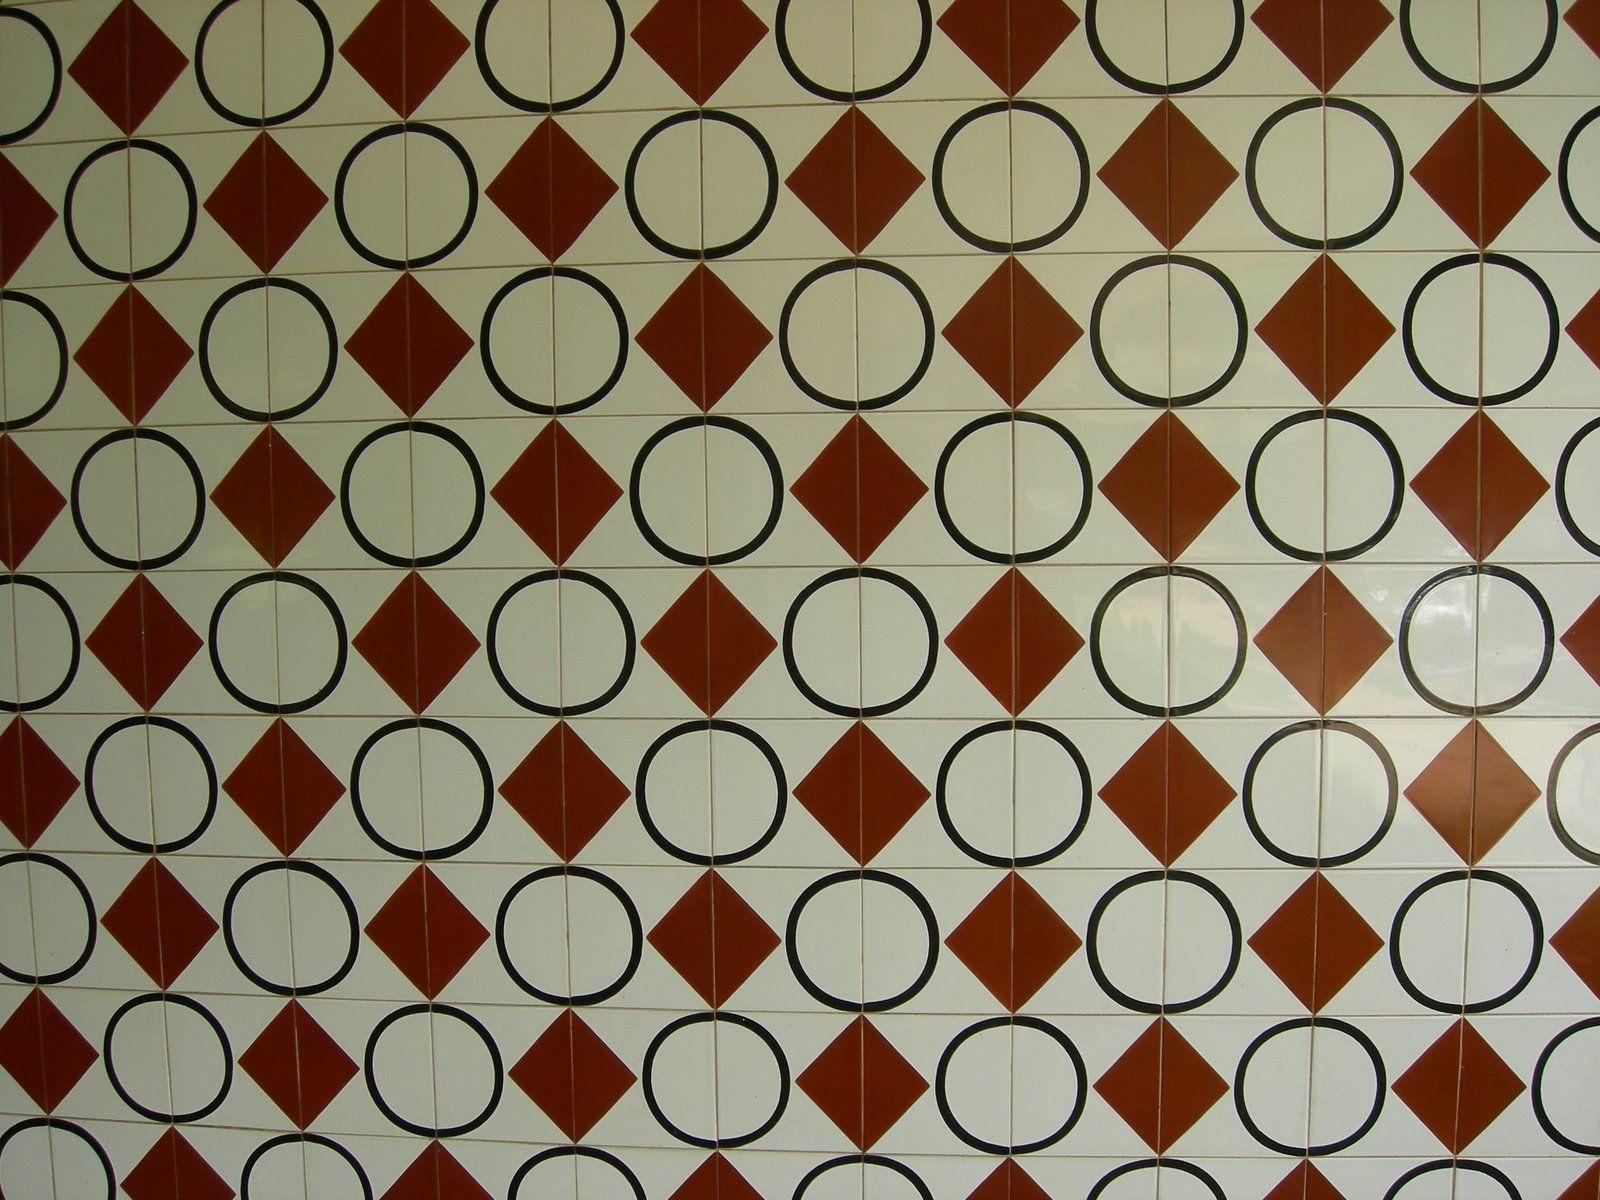 Athos Bulc O Tiles